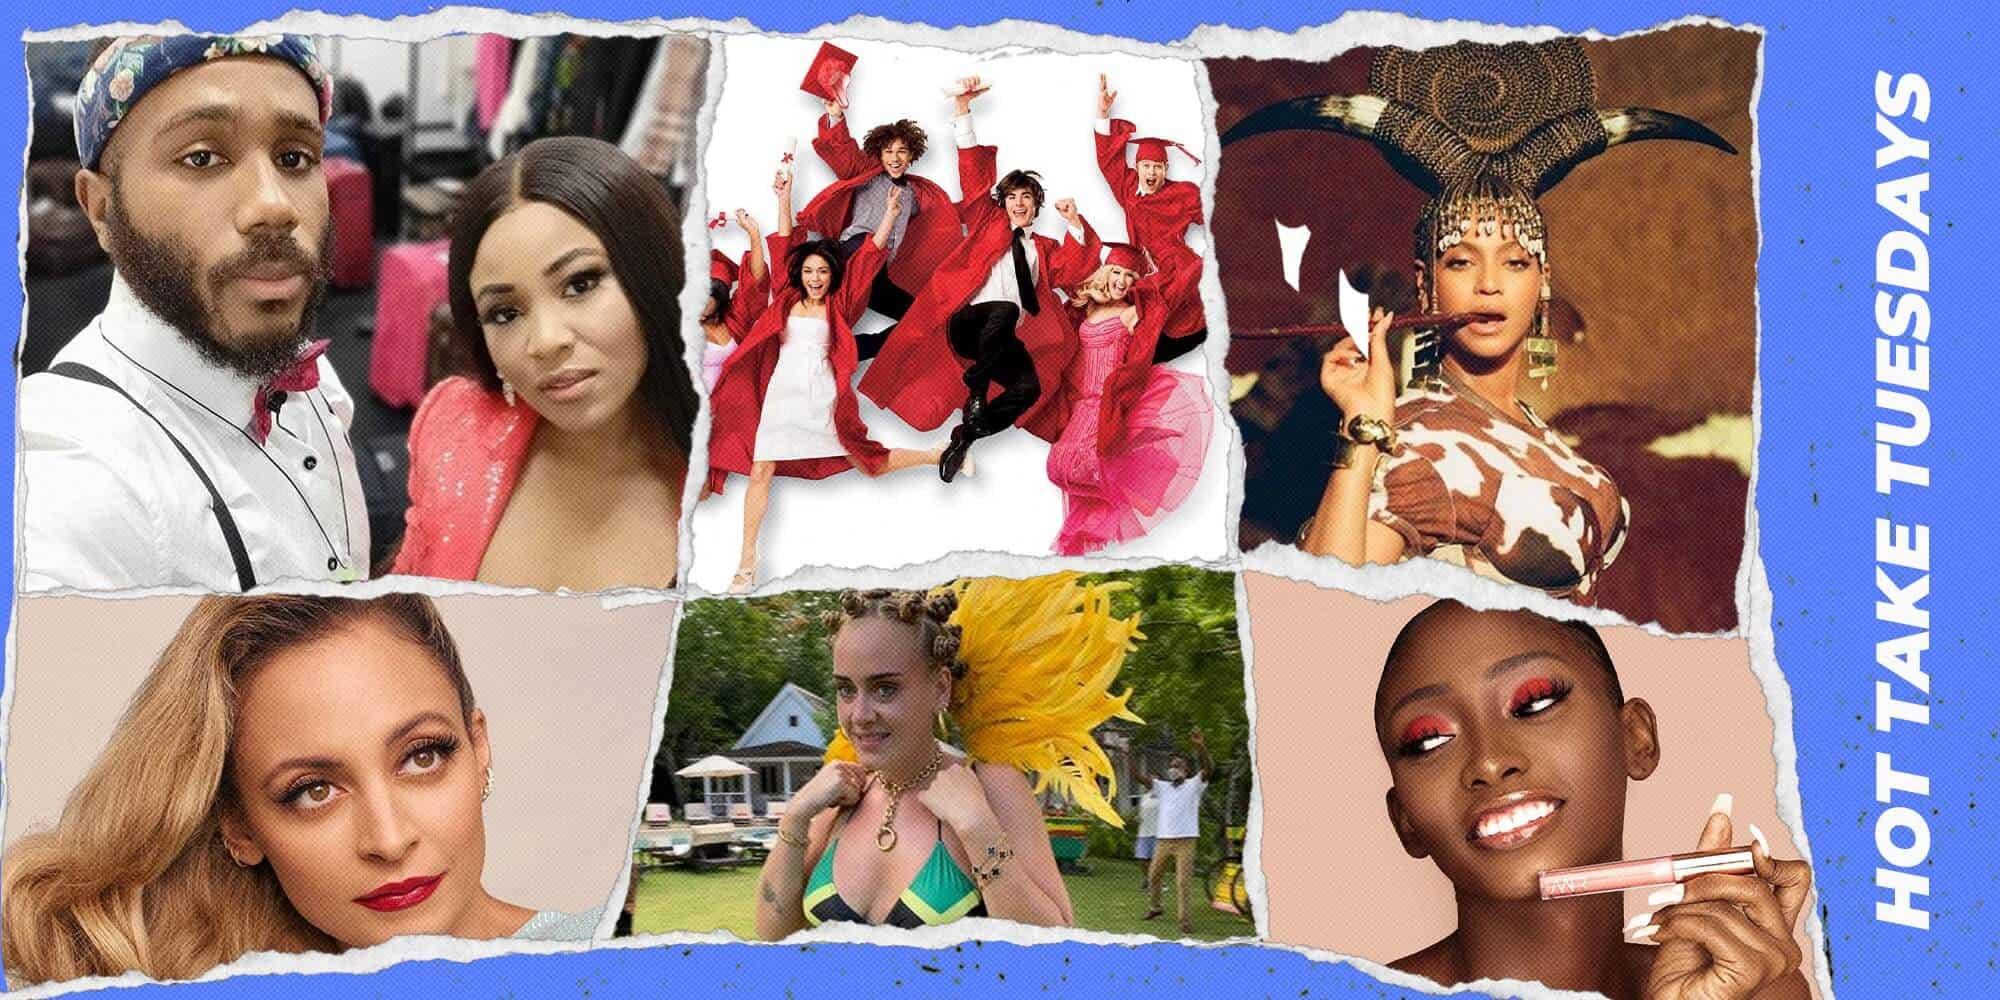 Hot Takes: KiddErica, Trap Nicole Richie & Dancehall Adele